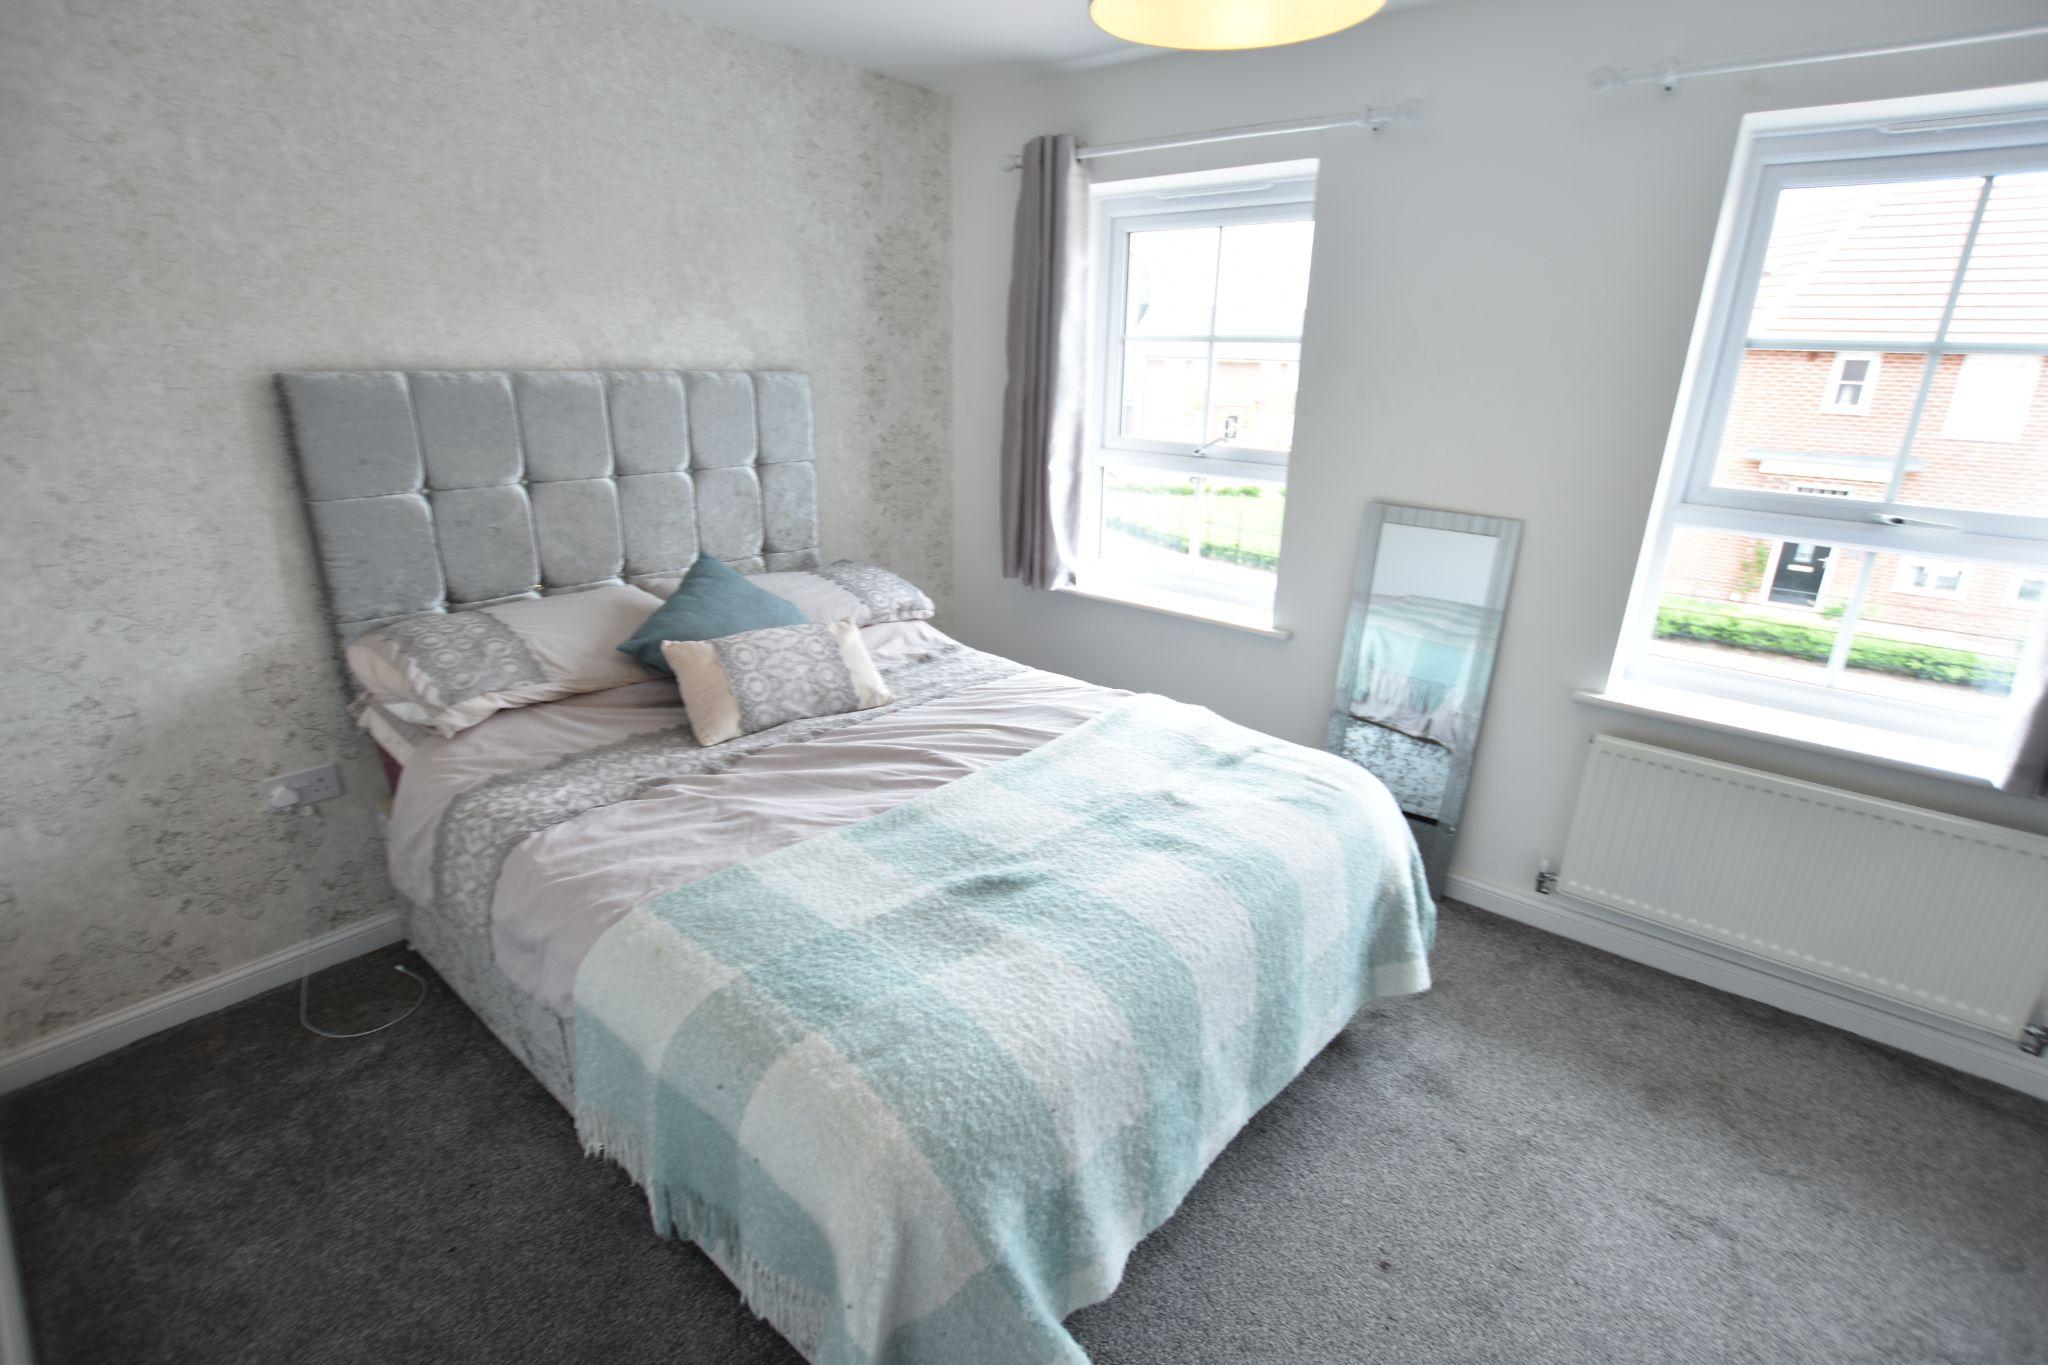 3 bedroom mid terraced house For Sale in Preston - Bedroom 1